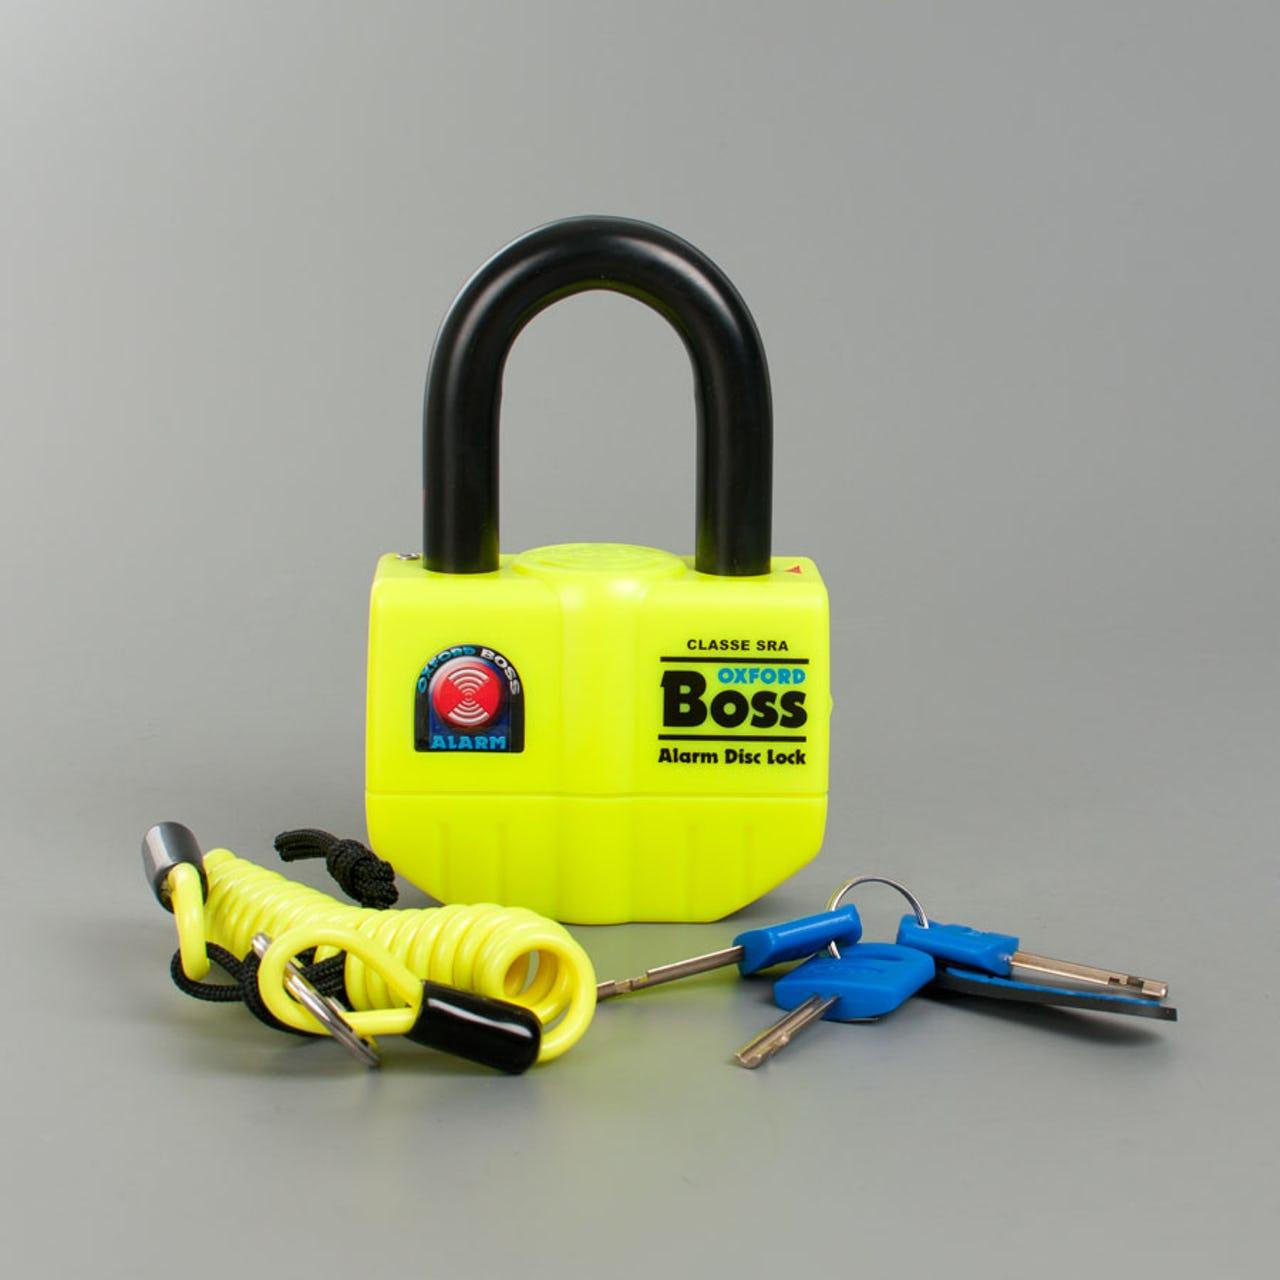 Oxford BIG Boss Alarmed Lock 16 mm - £47.15 @ XL Moto